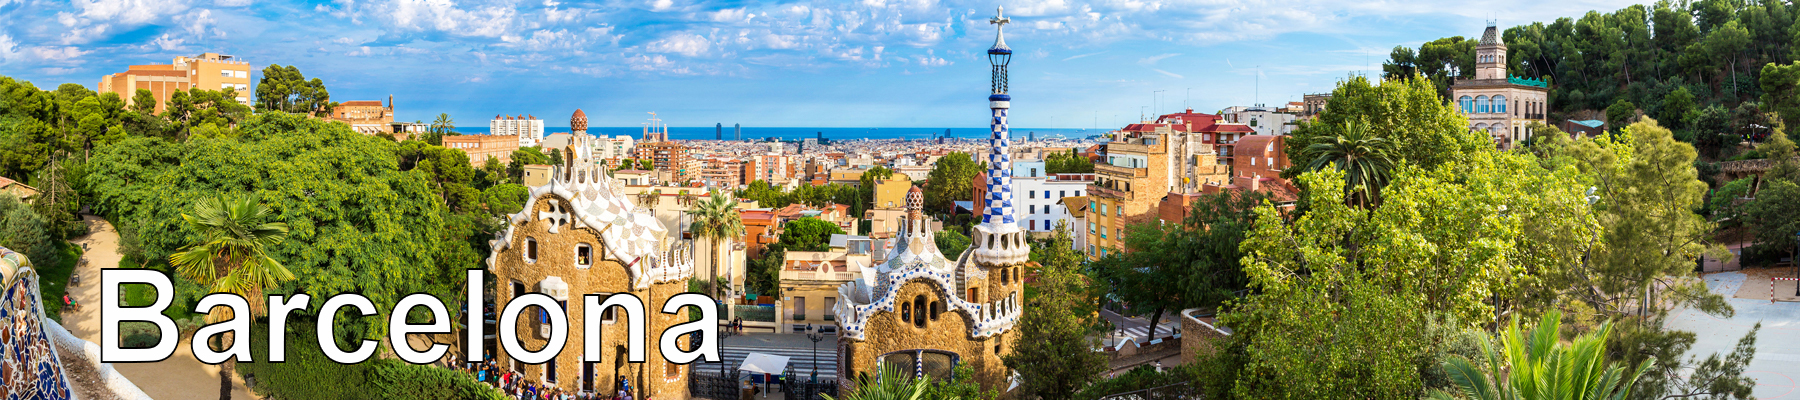 Barcelona: De ultieme citytrip